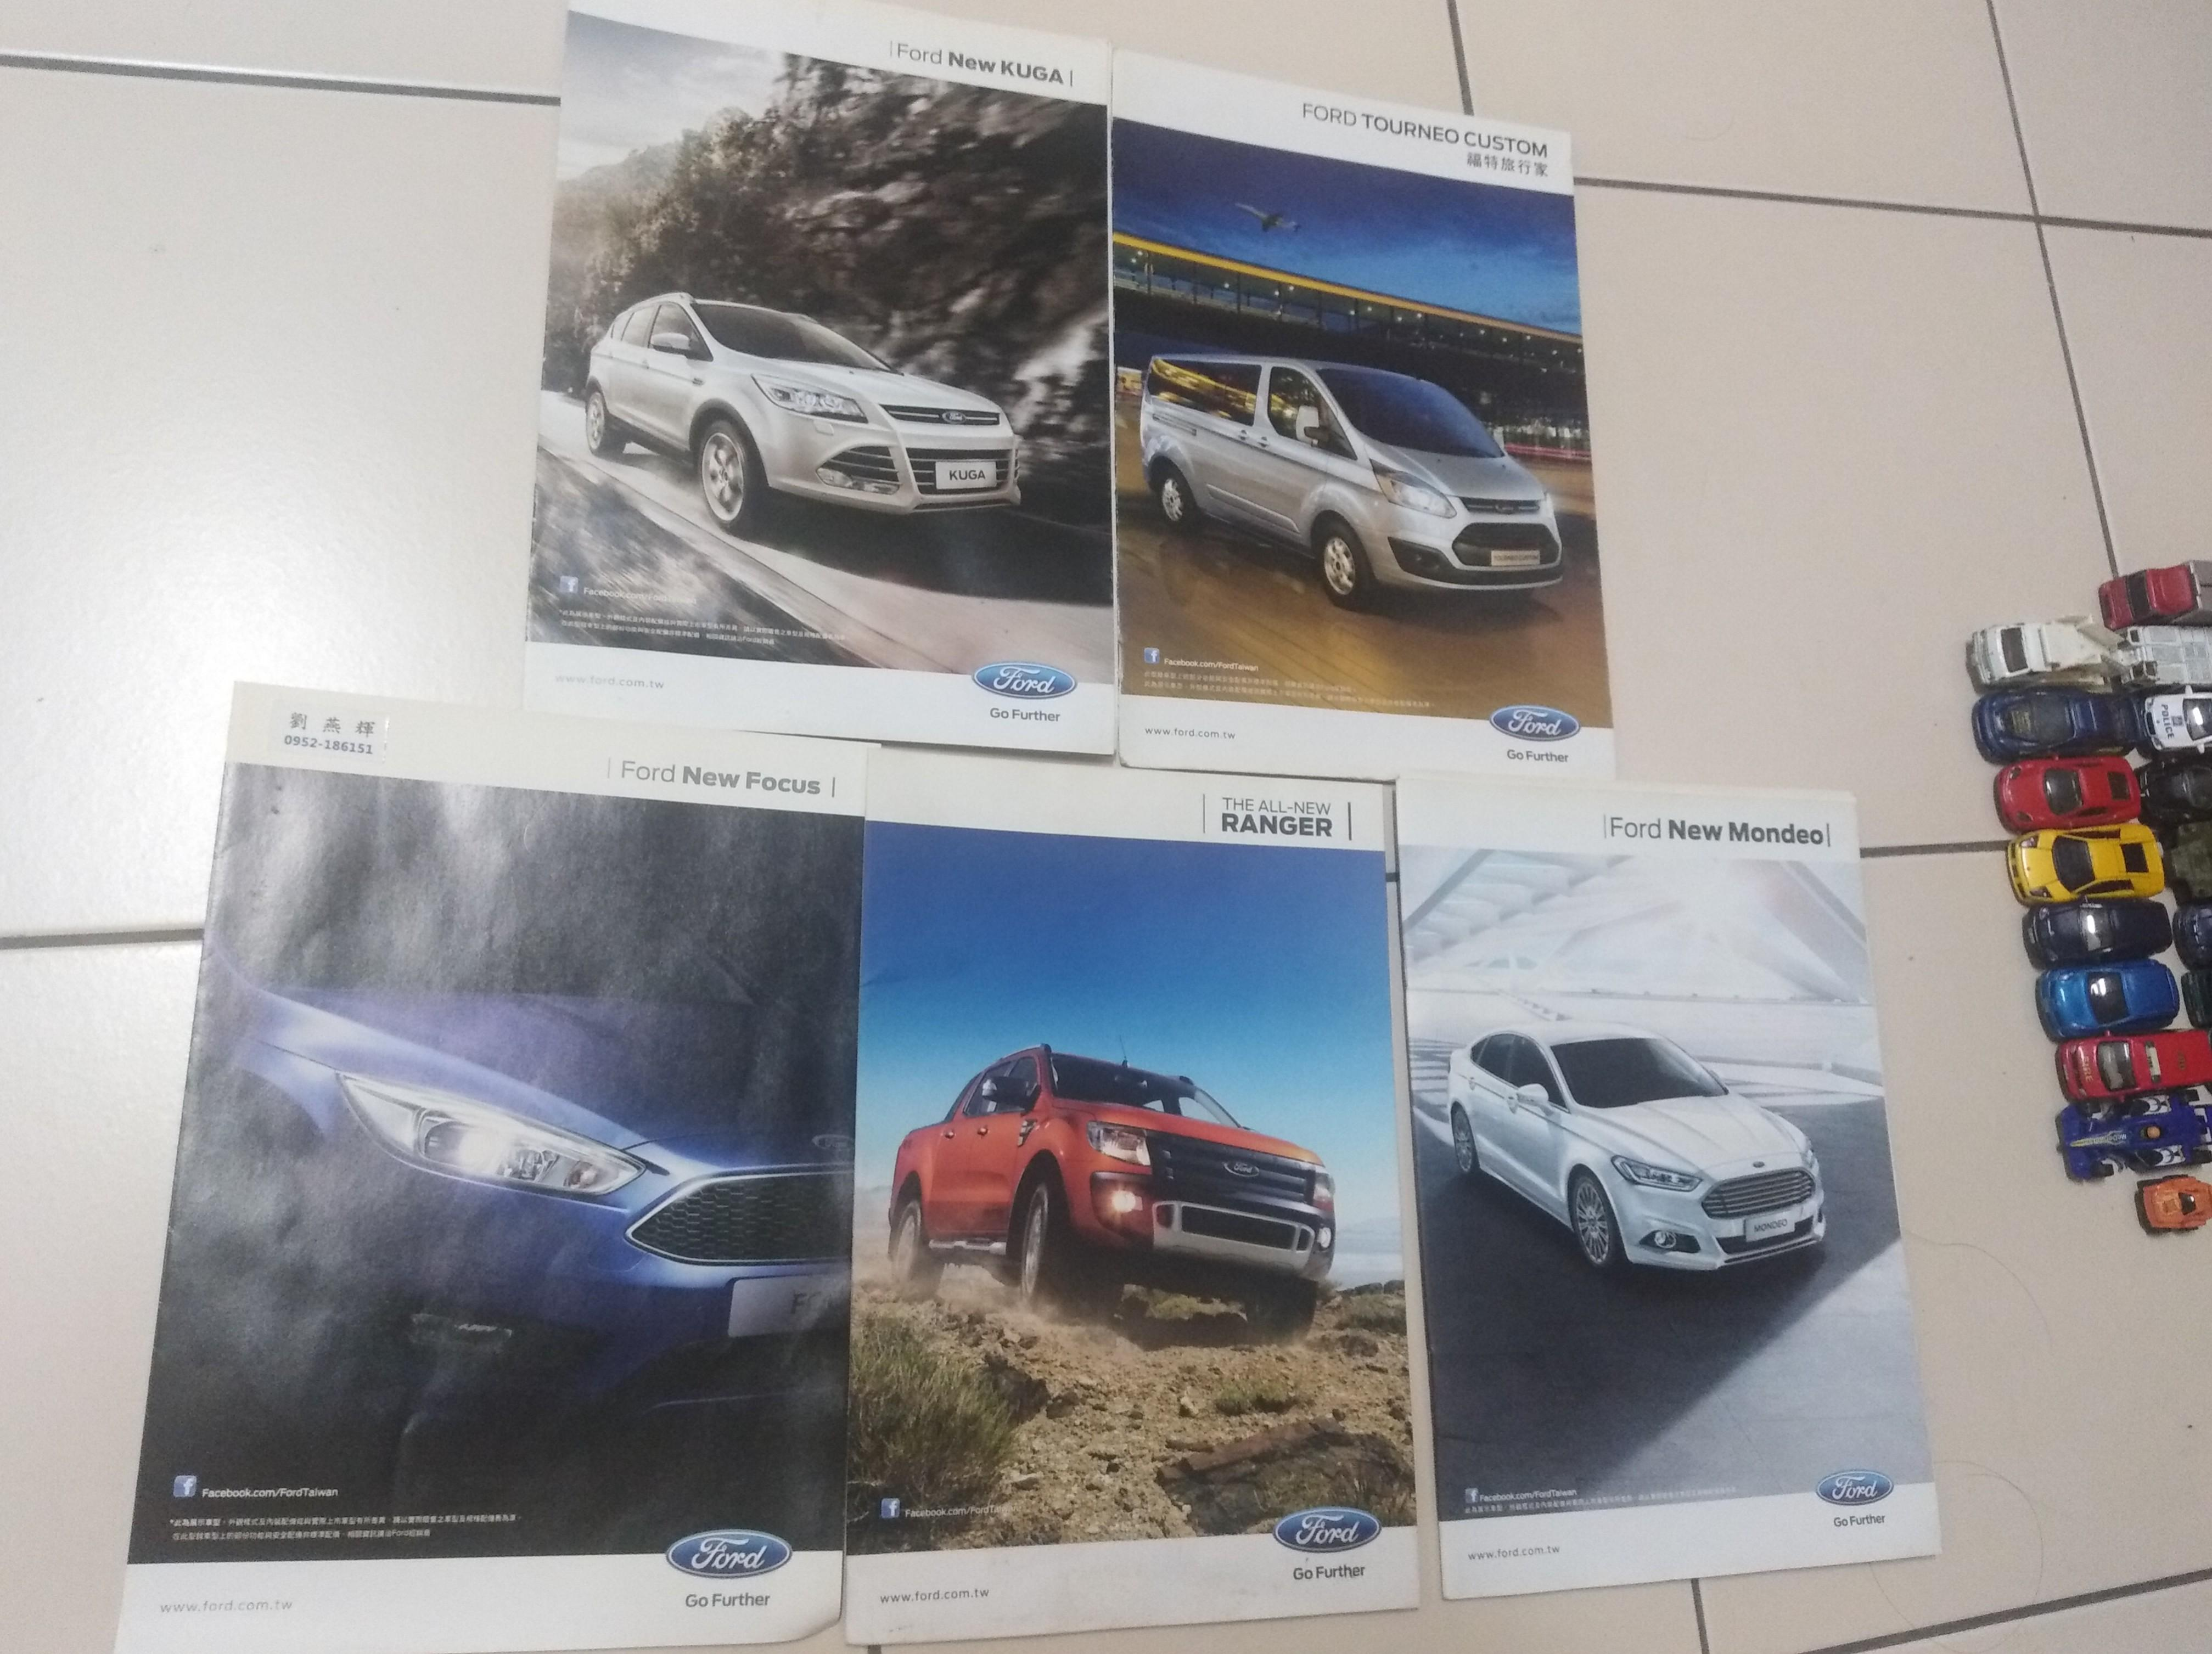 Ford型錄